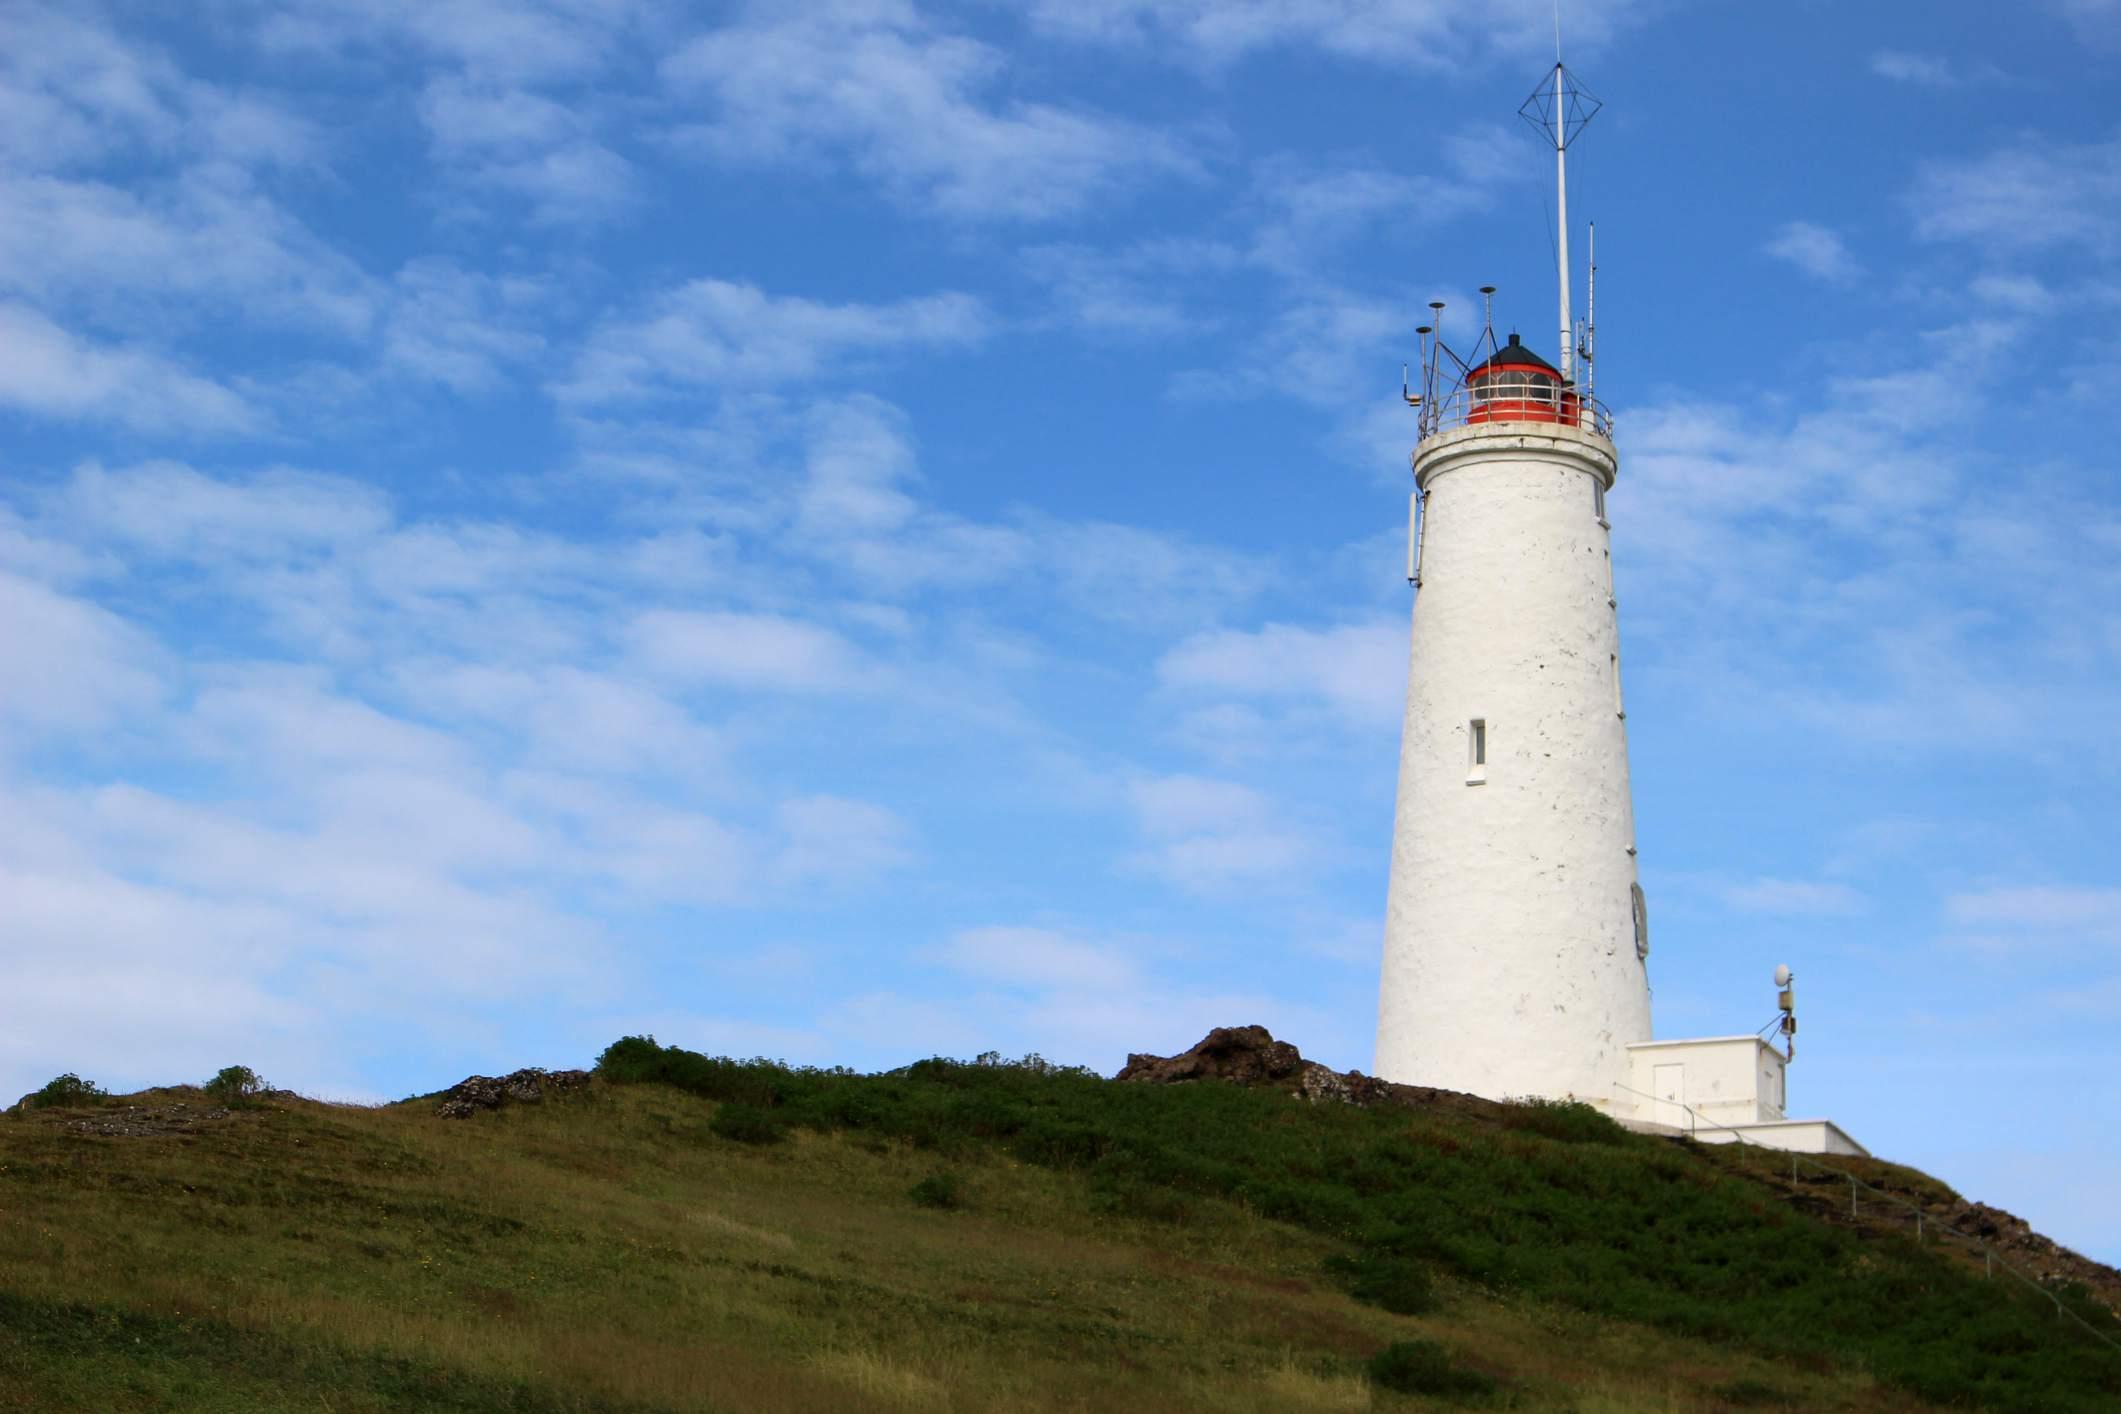 View of Reykjanes Lighthouse (Reykjanesviti), Iceland's oldest lighthouse.